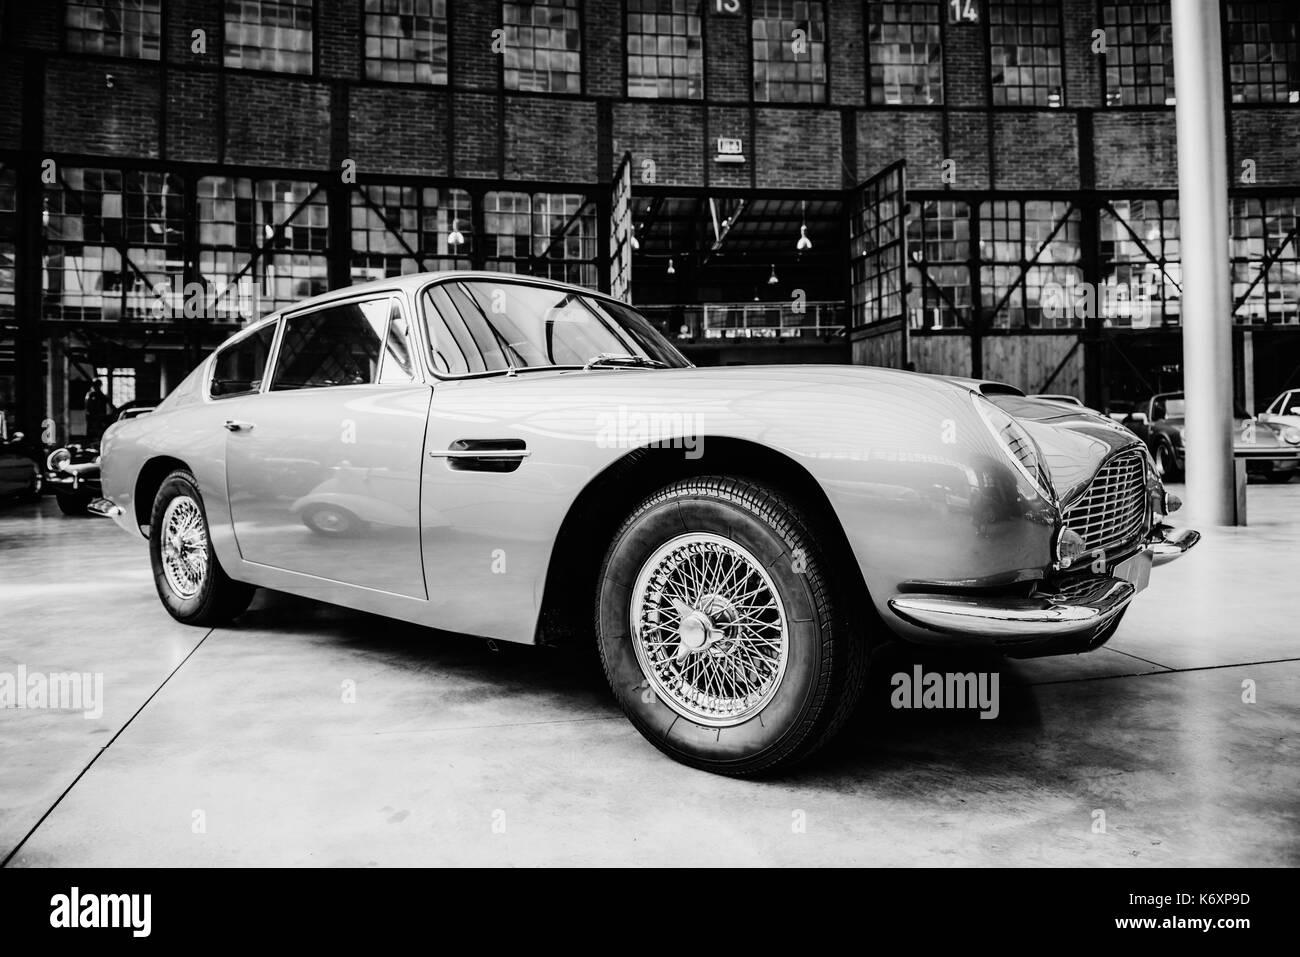 Retro Style Car Stock Photos & Retro Style Car Stock Images - Alamy